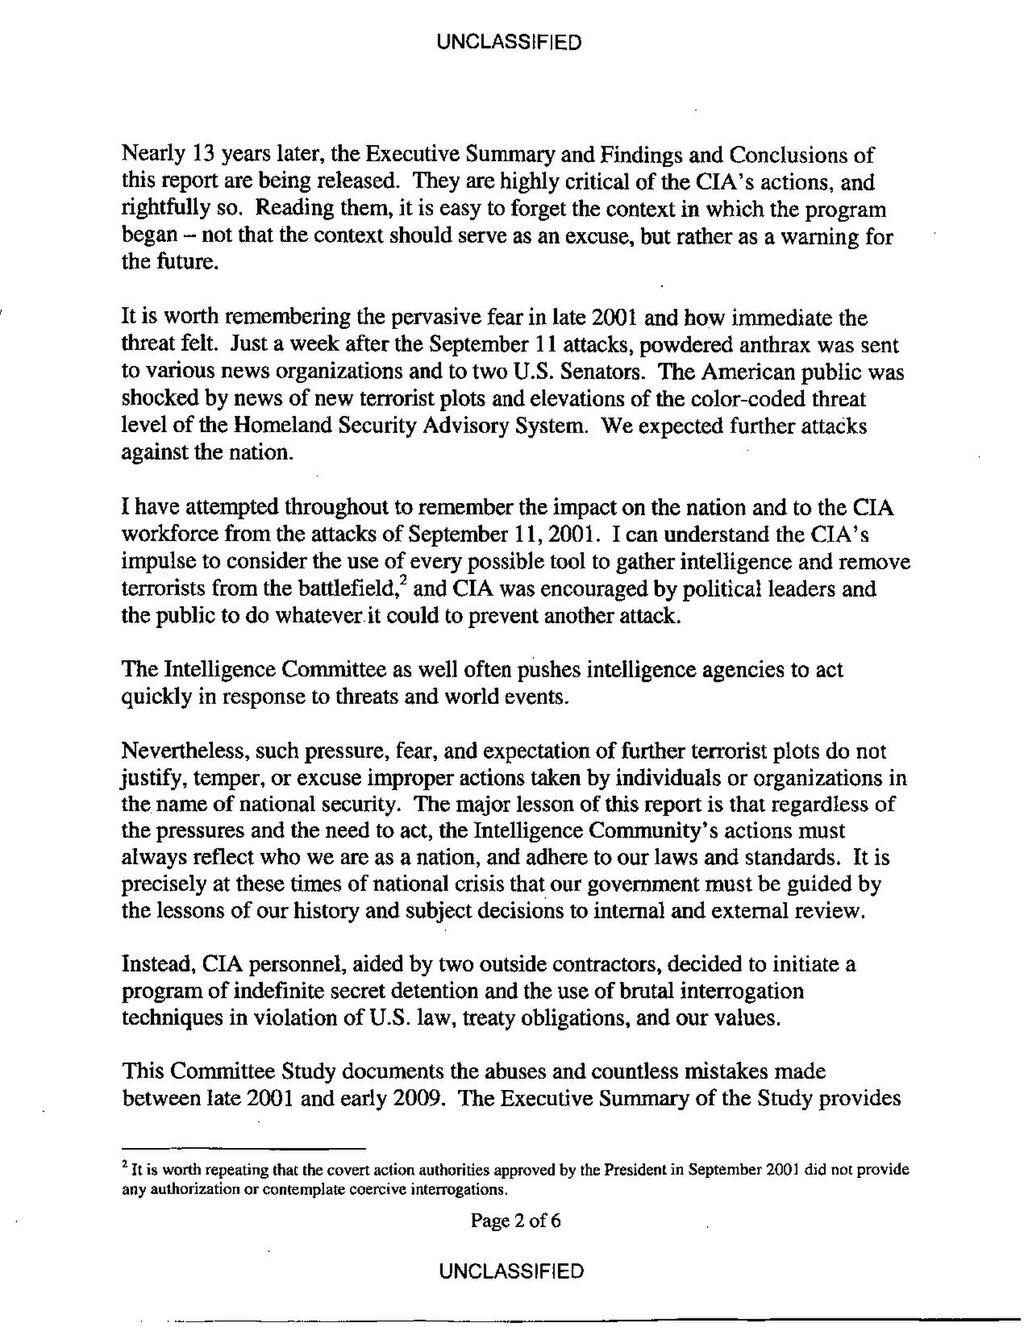 PageUS Senate Report on CIA Detention Interrogation